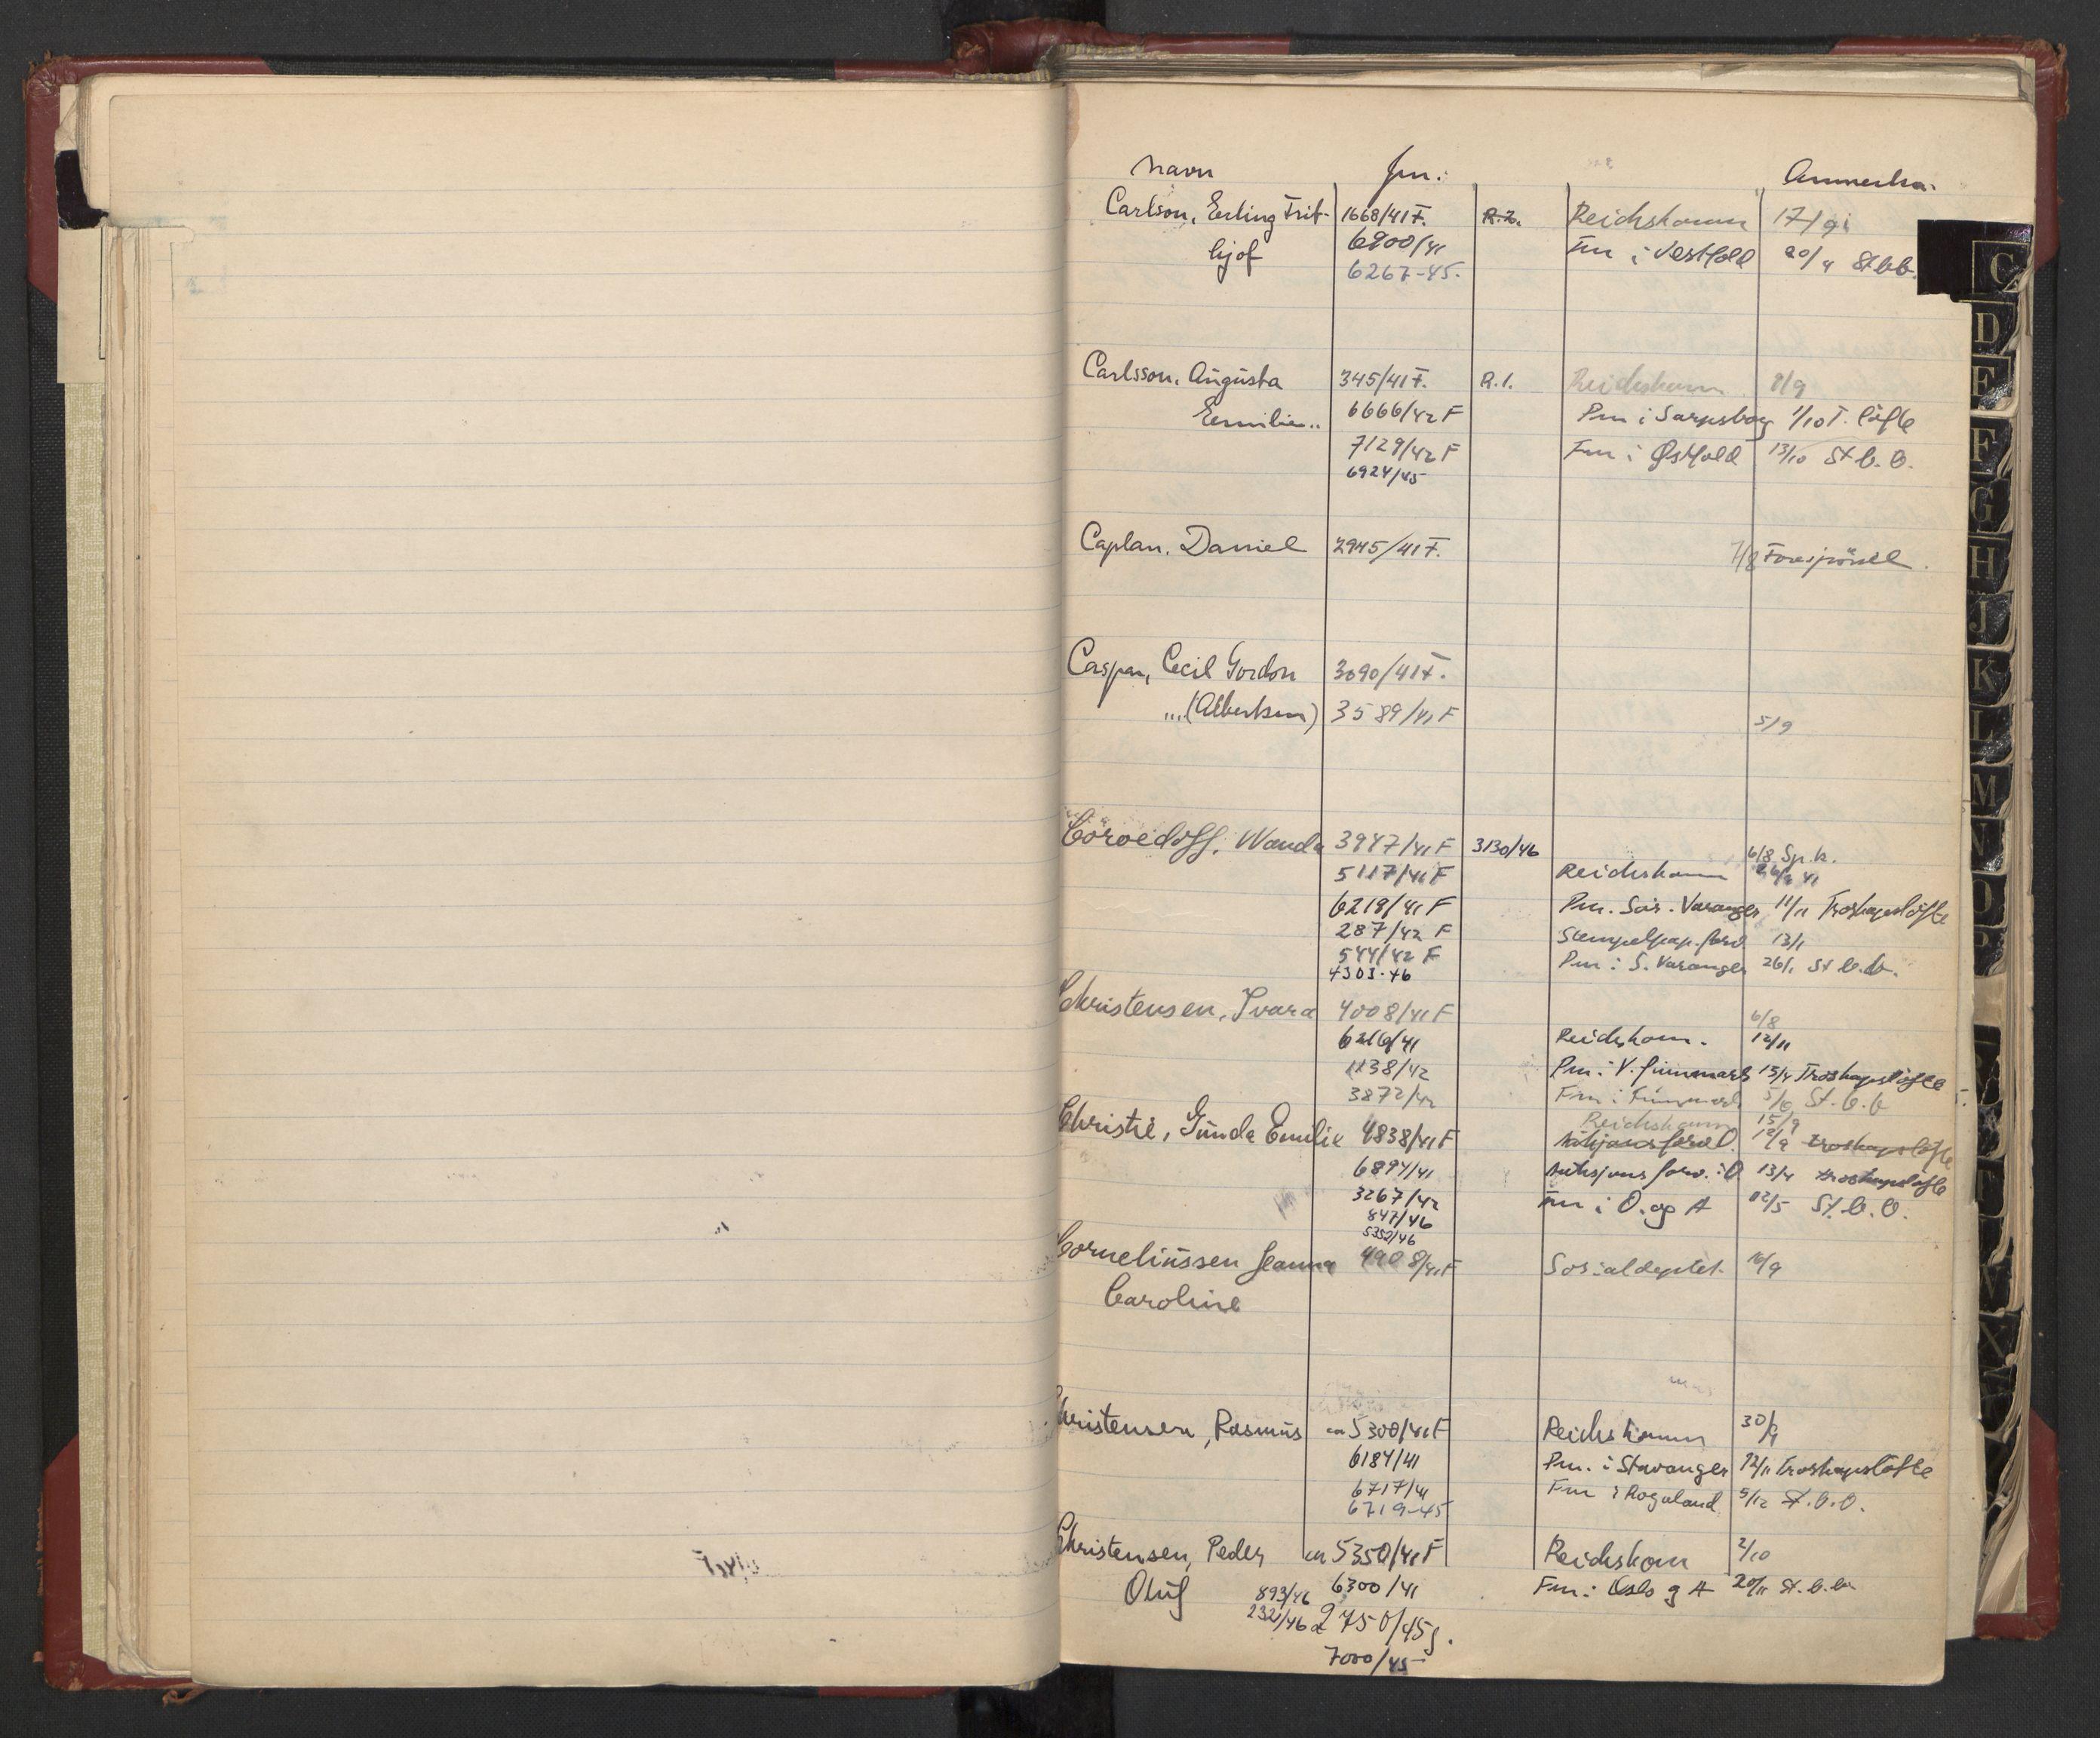 RA, Justisdepartementet, 3. politikontor P3, C/Cc/L0002: Journalregister over statsborgersaker, 1940-1946, s. 16